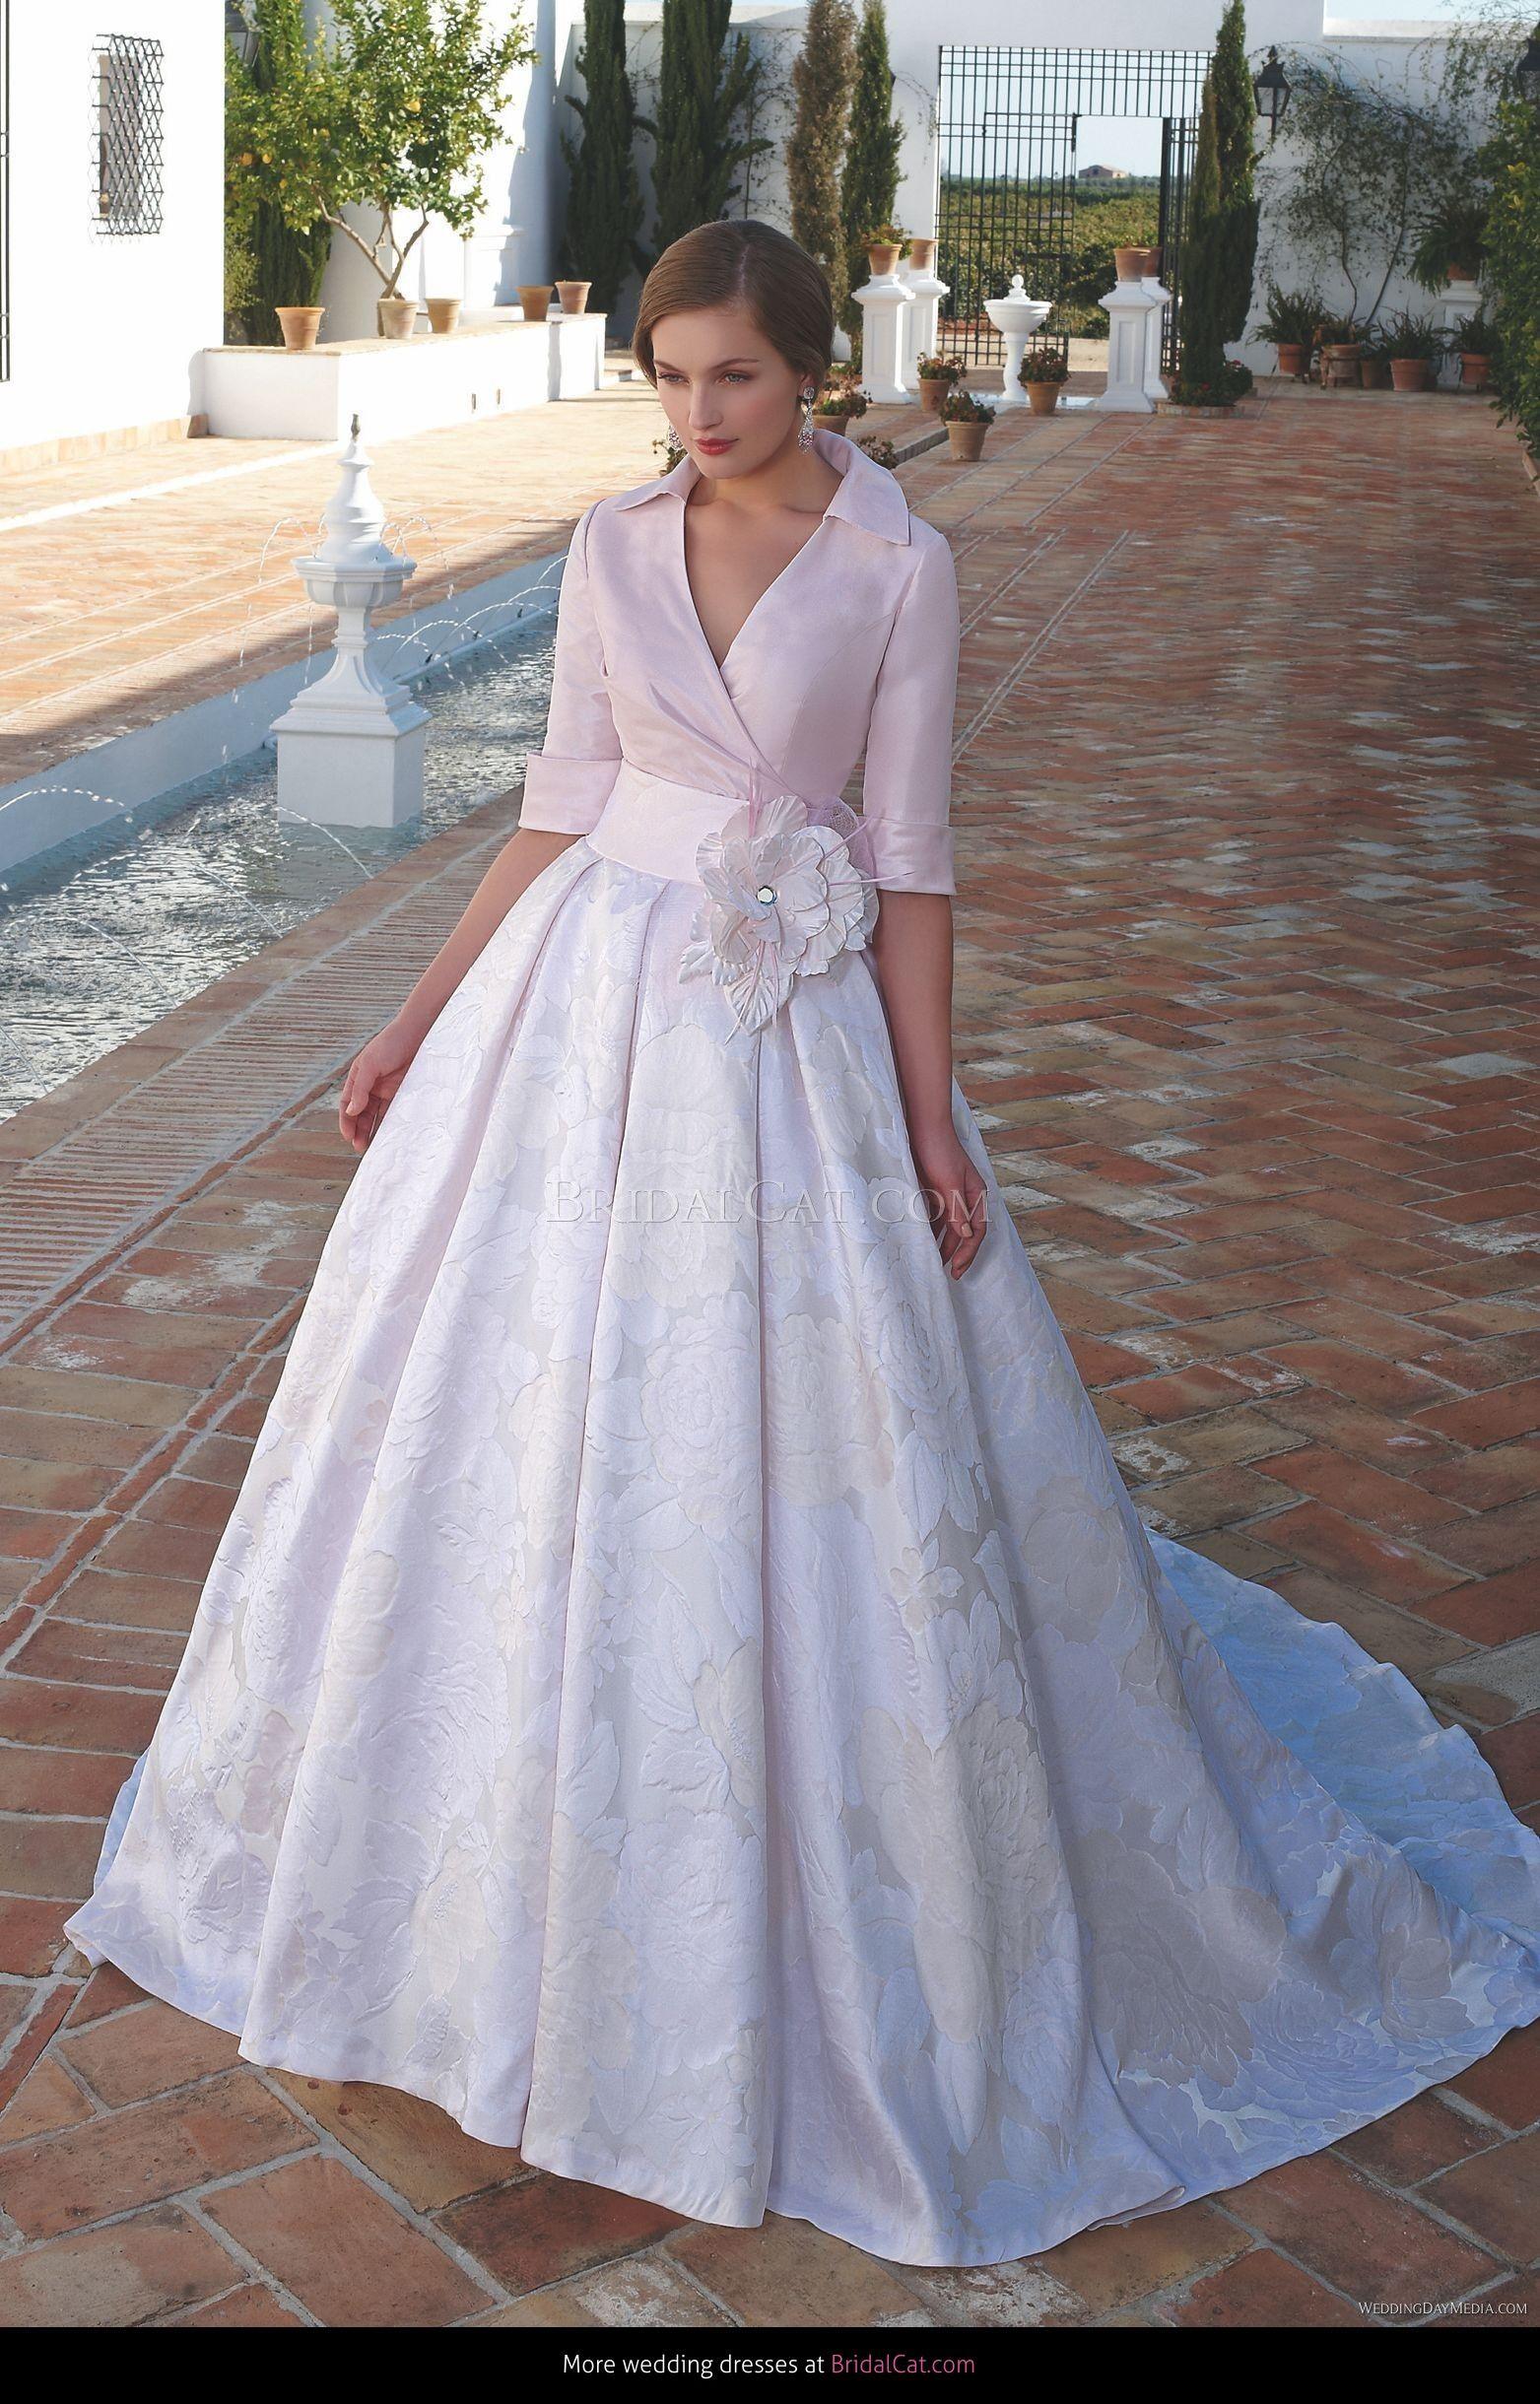 Wedding dress manu garcía mg bridalcat gwand